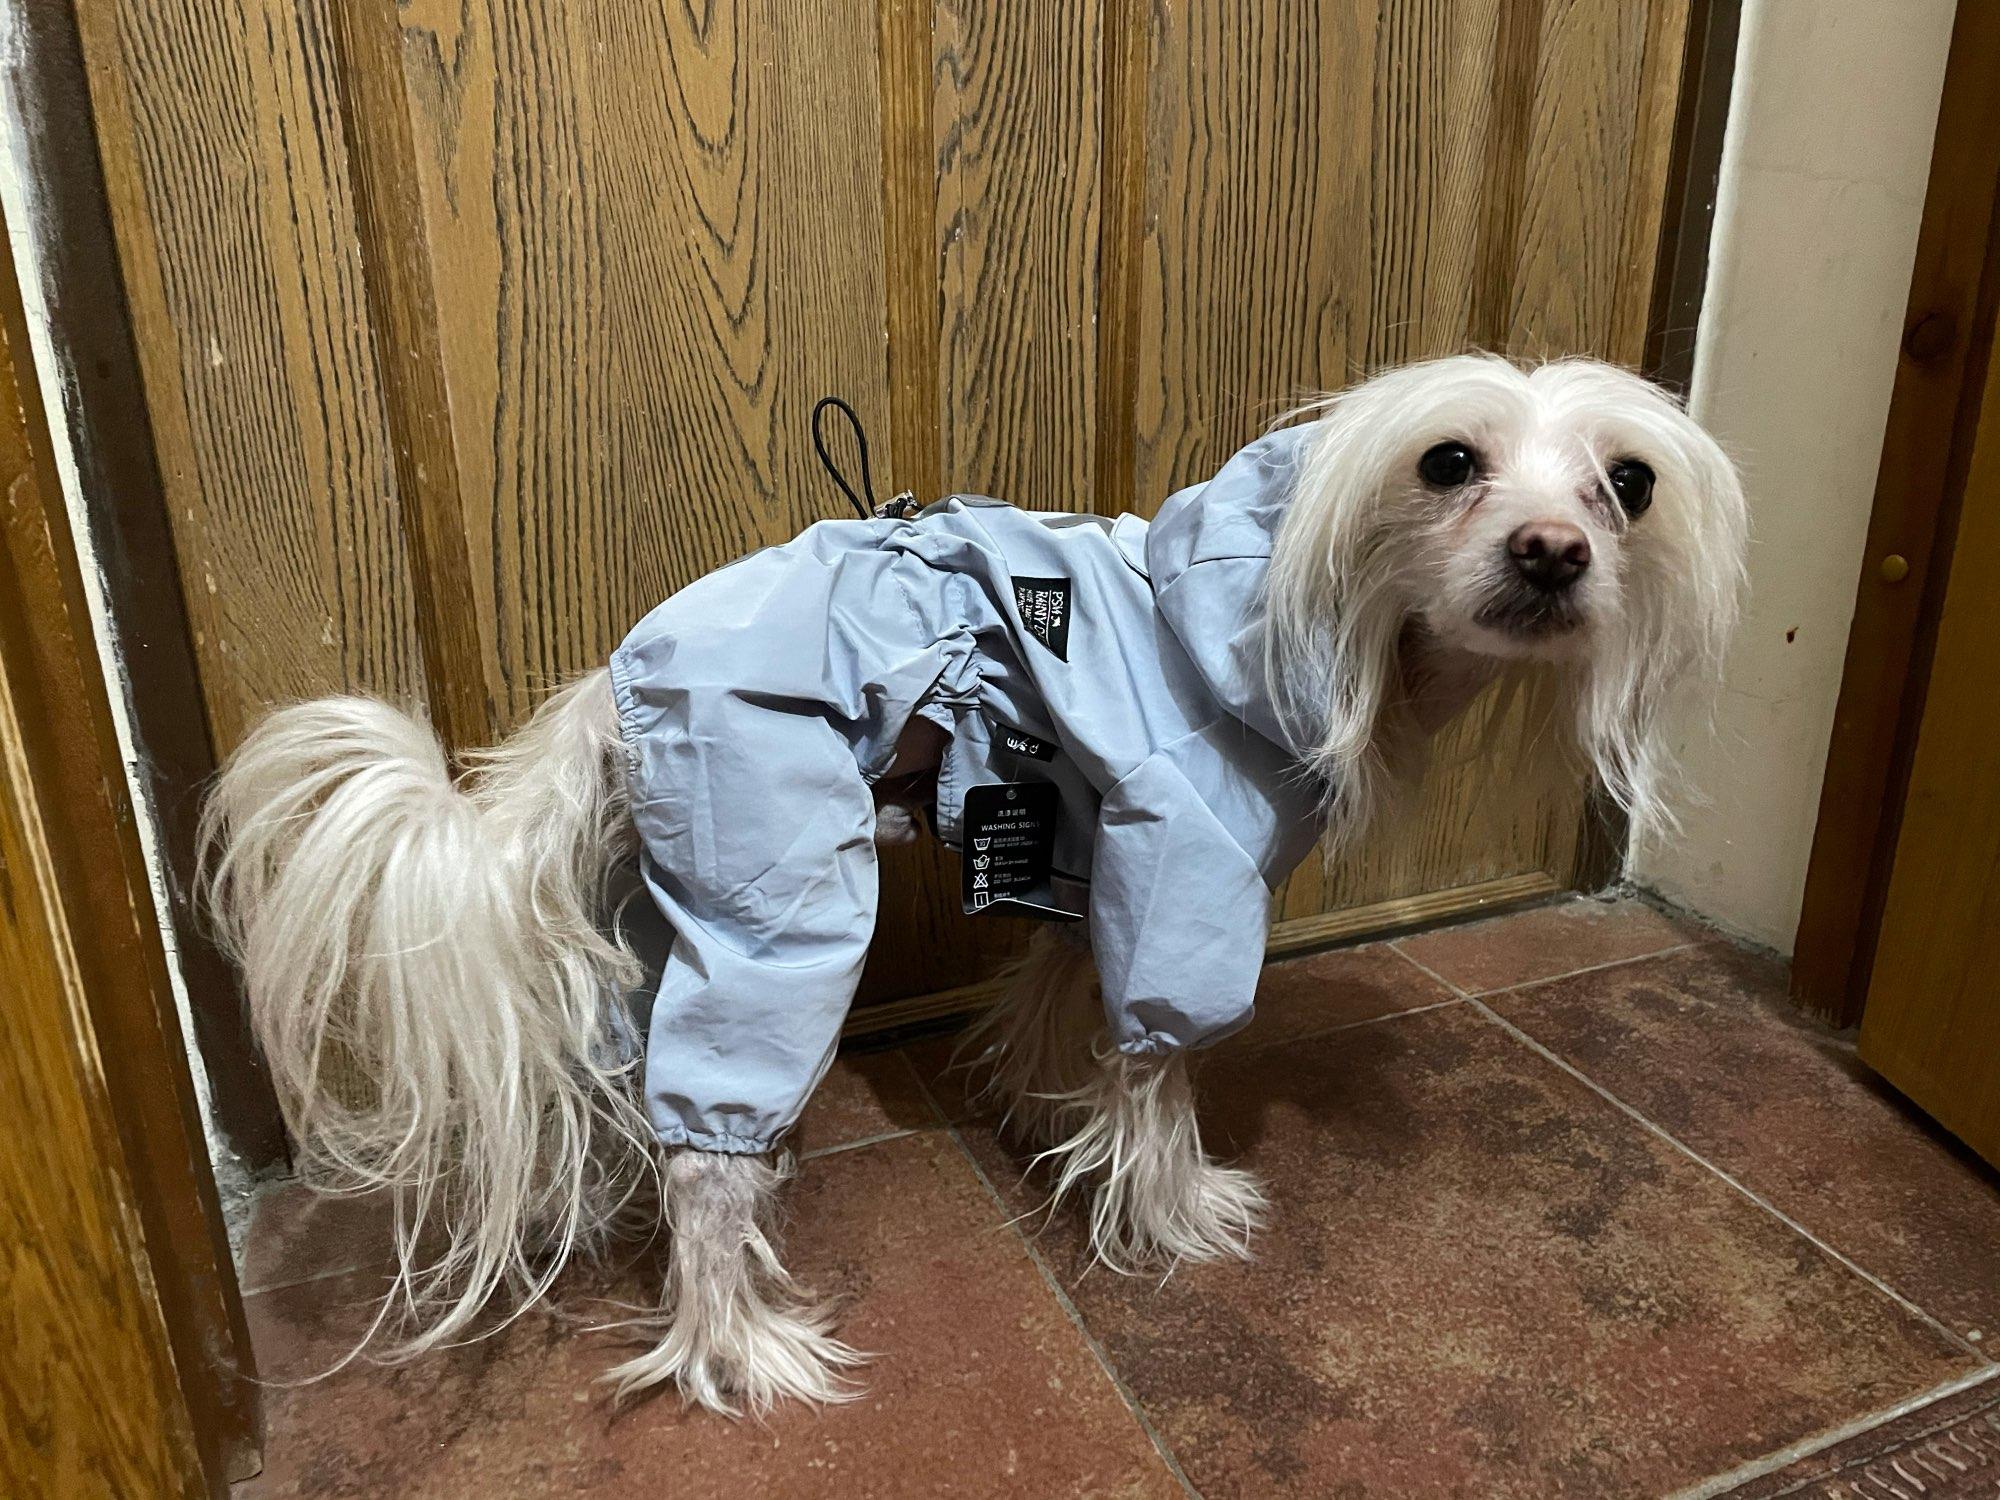 Pet Dog Puppy Reflective Raincoat Waterproof Coat Hooded Jacket